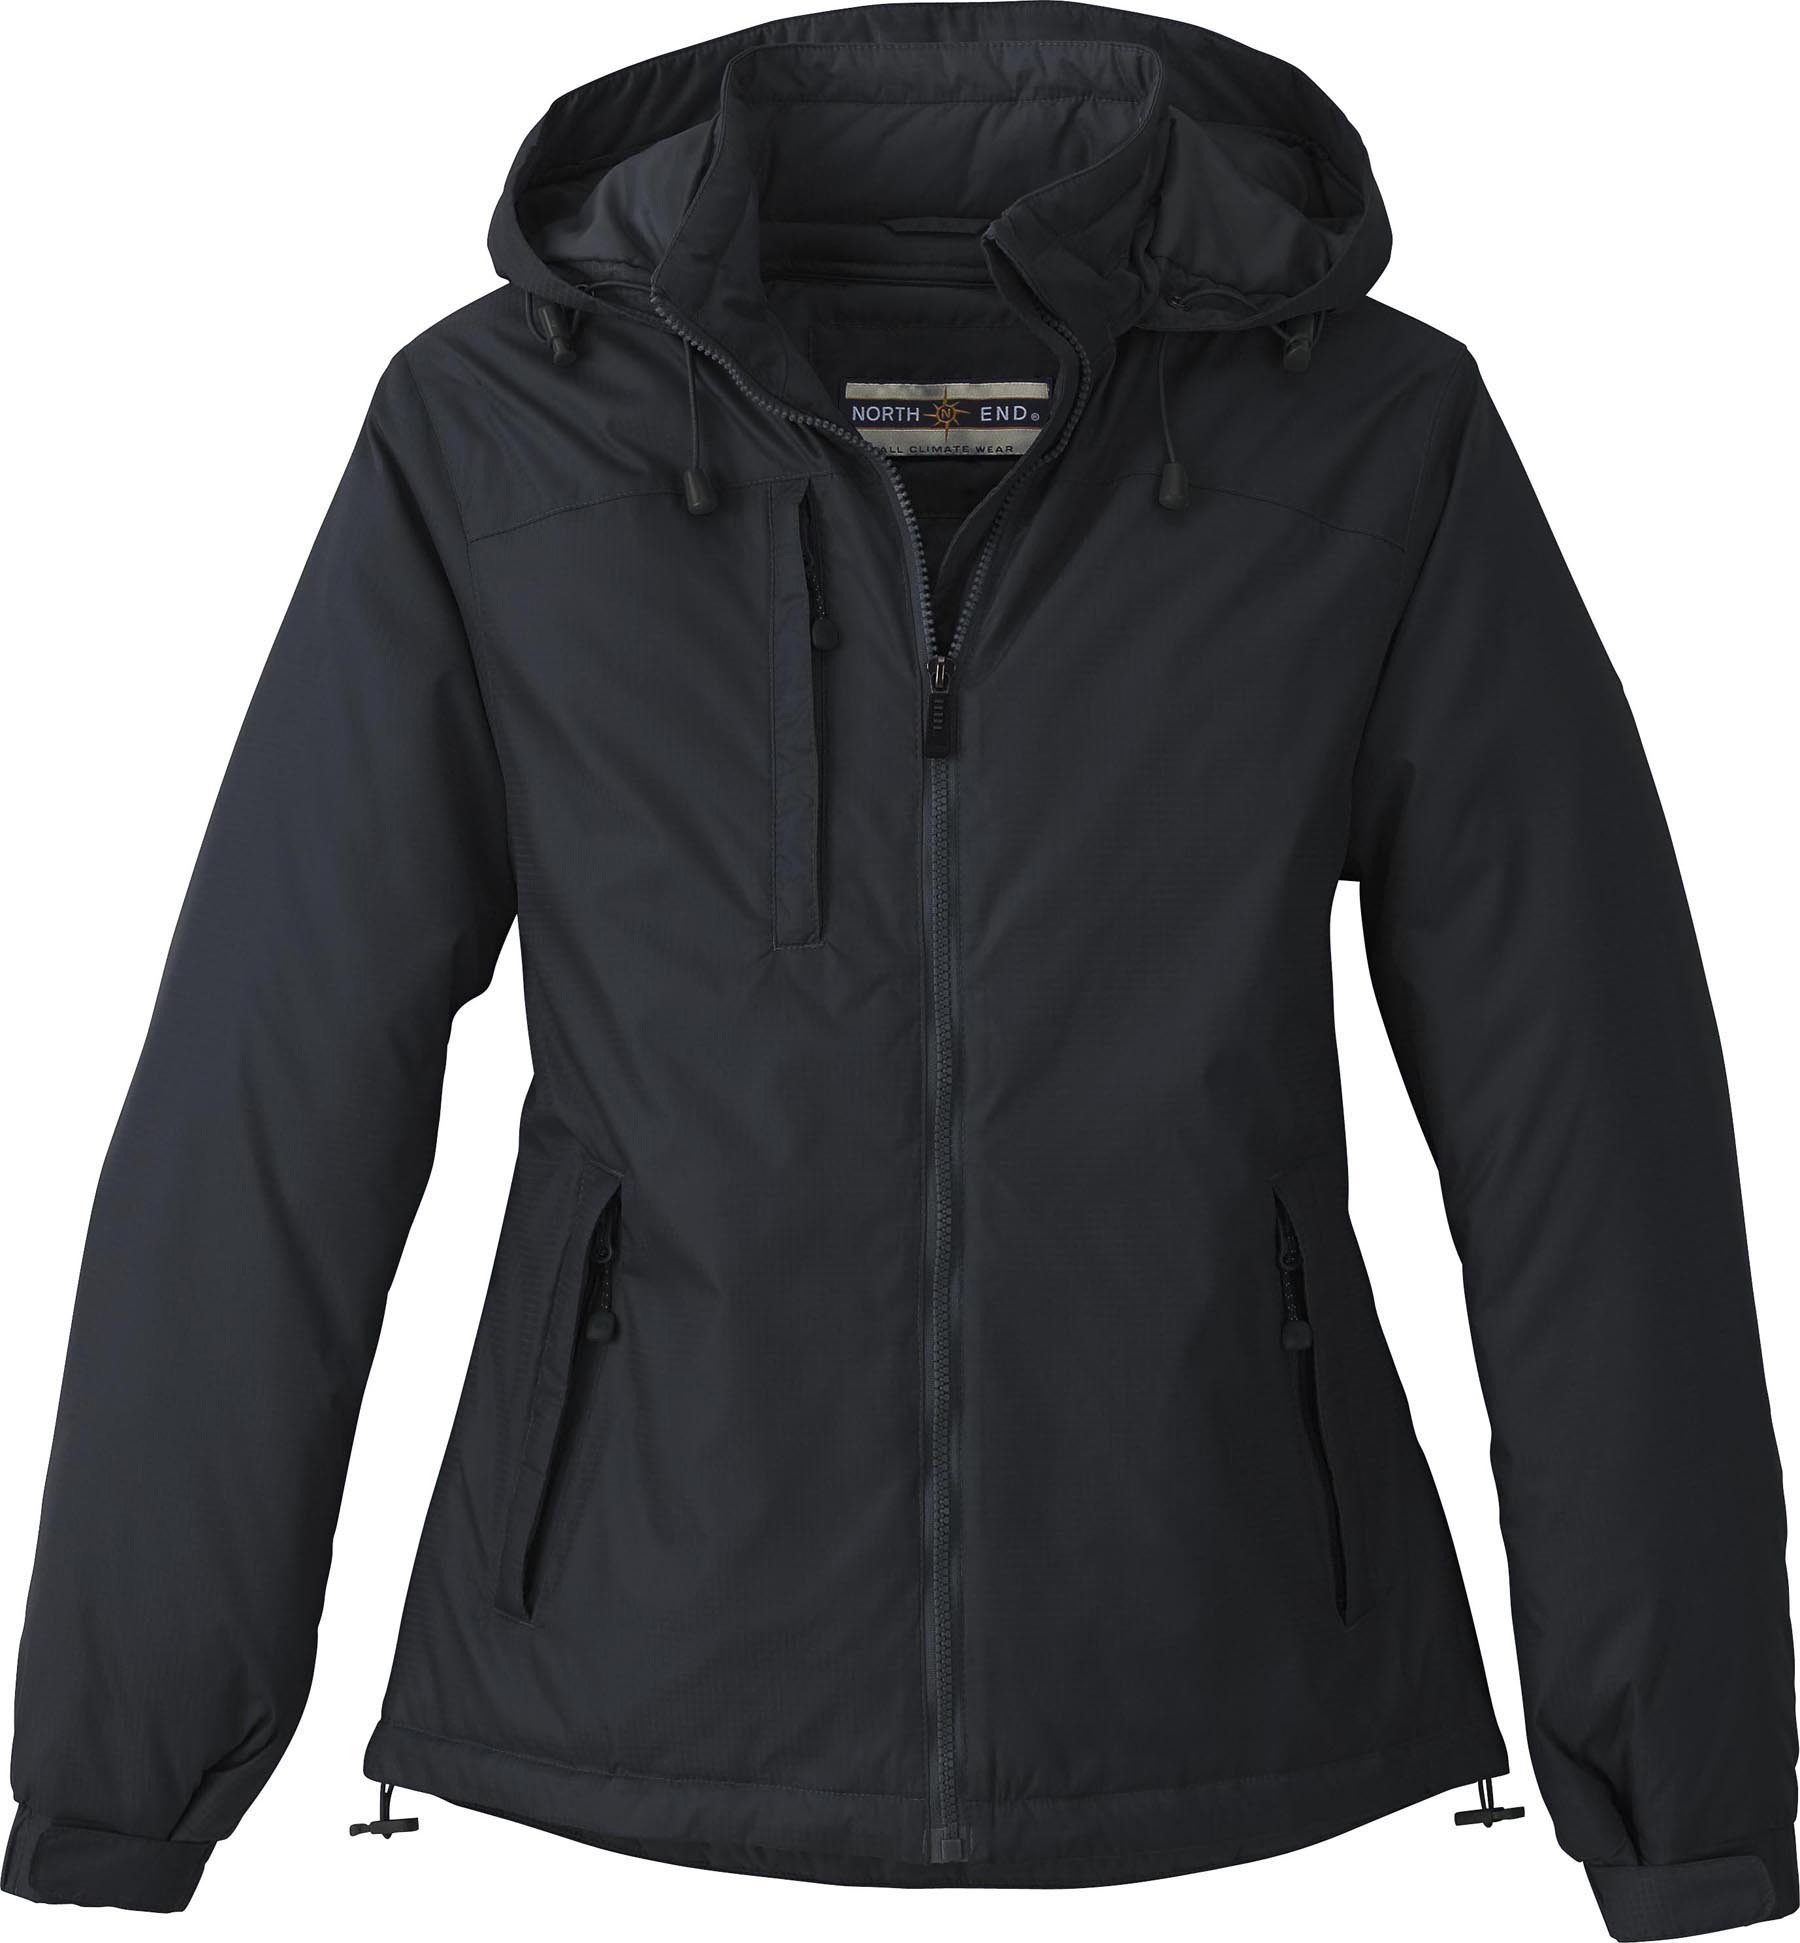 Ash City UTK 2 Warm.Logik 78059 - Ladies' Hi-Loft Insulated Jacket